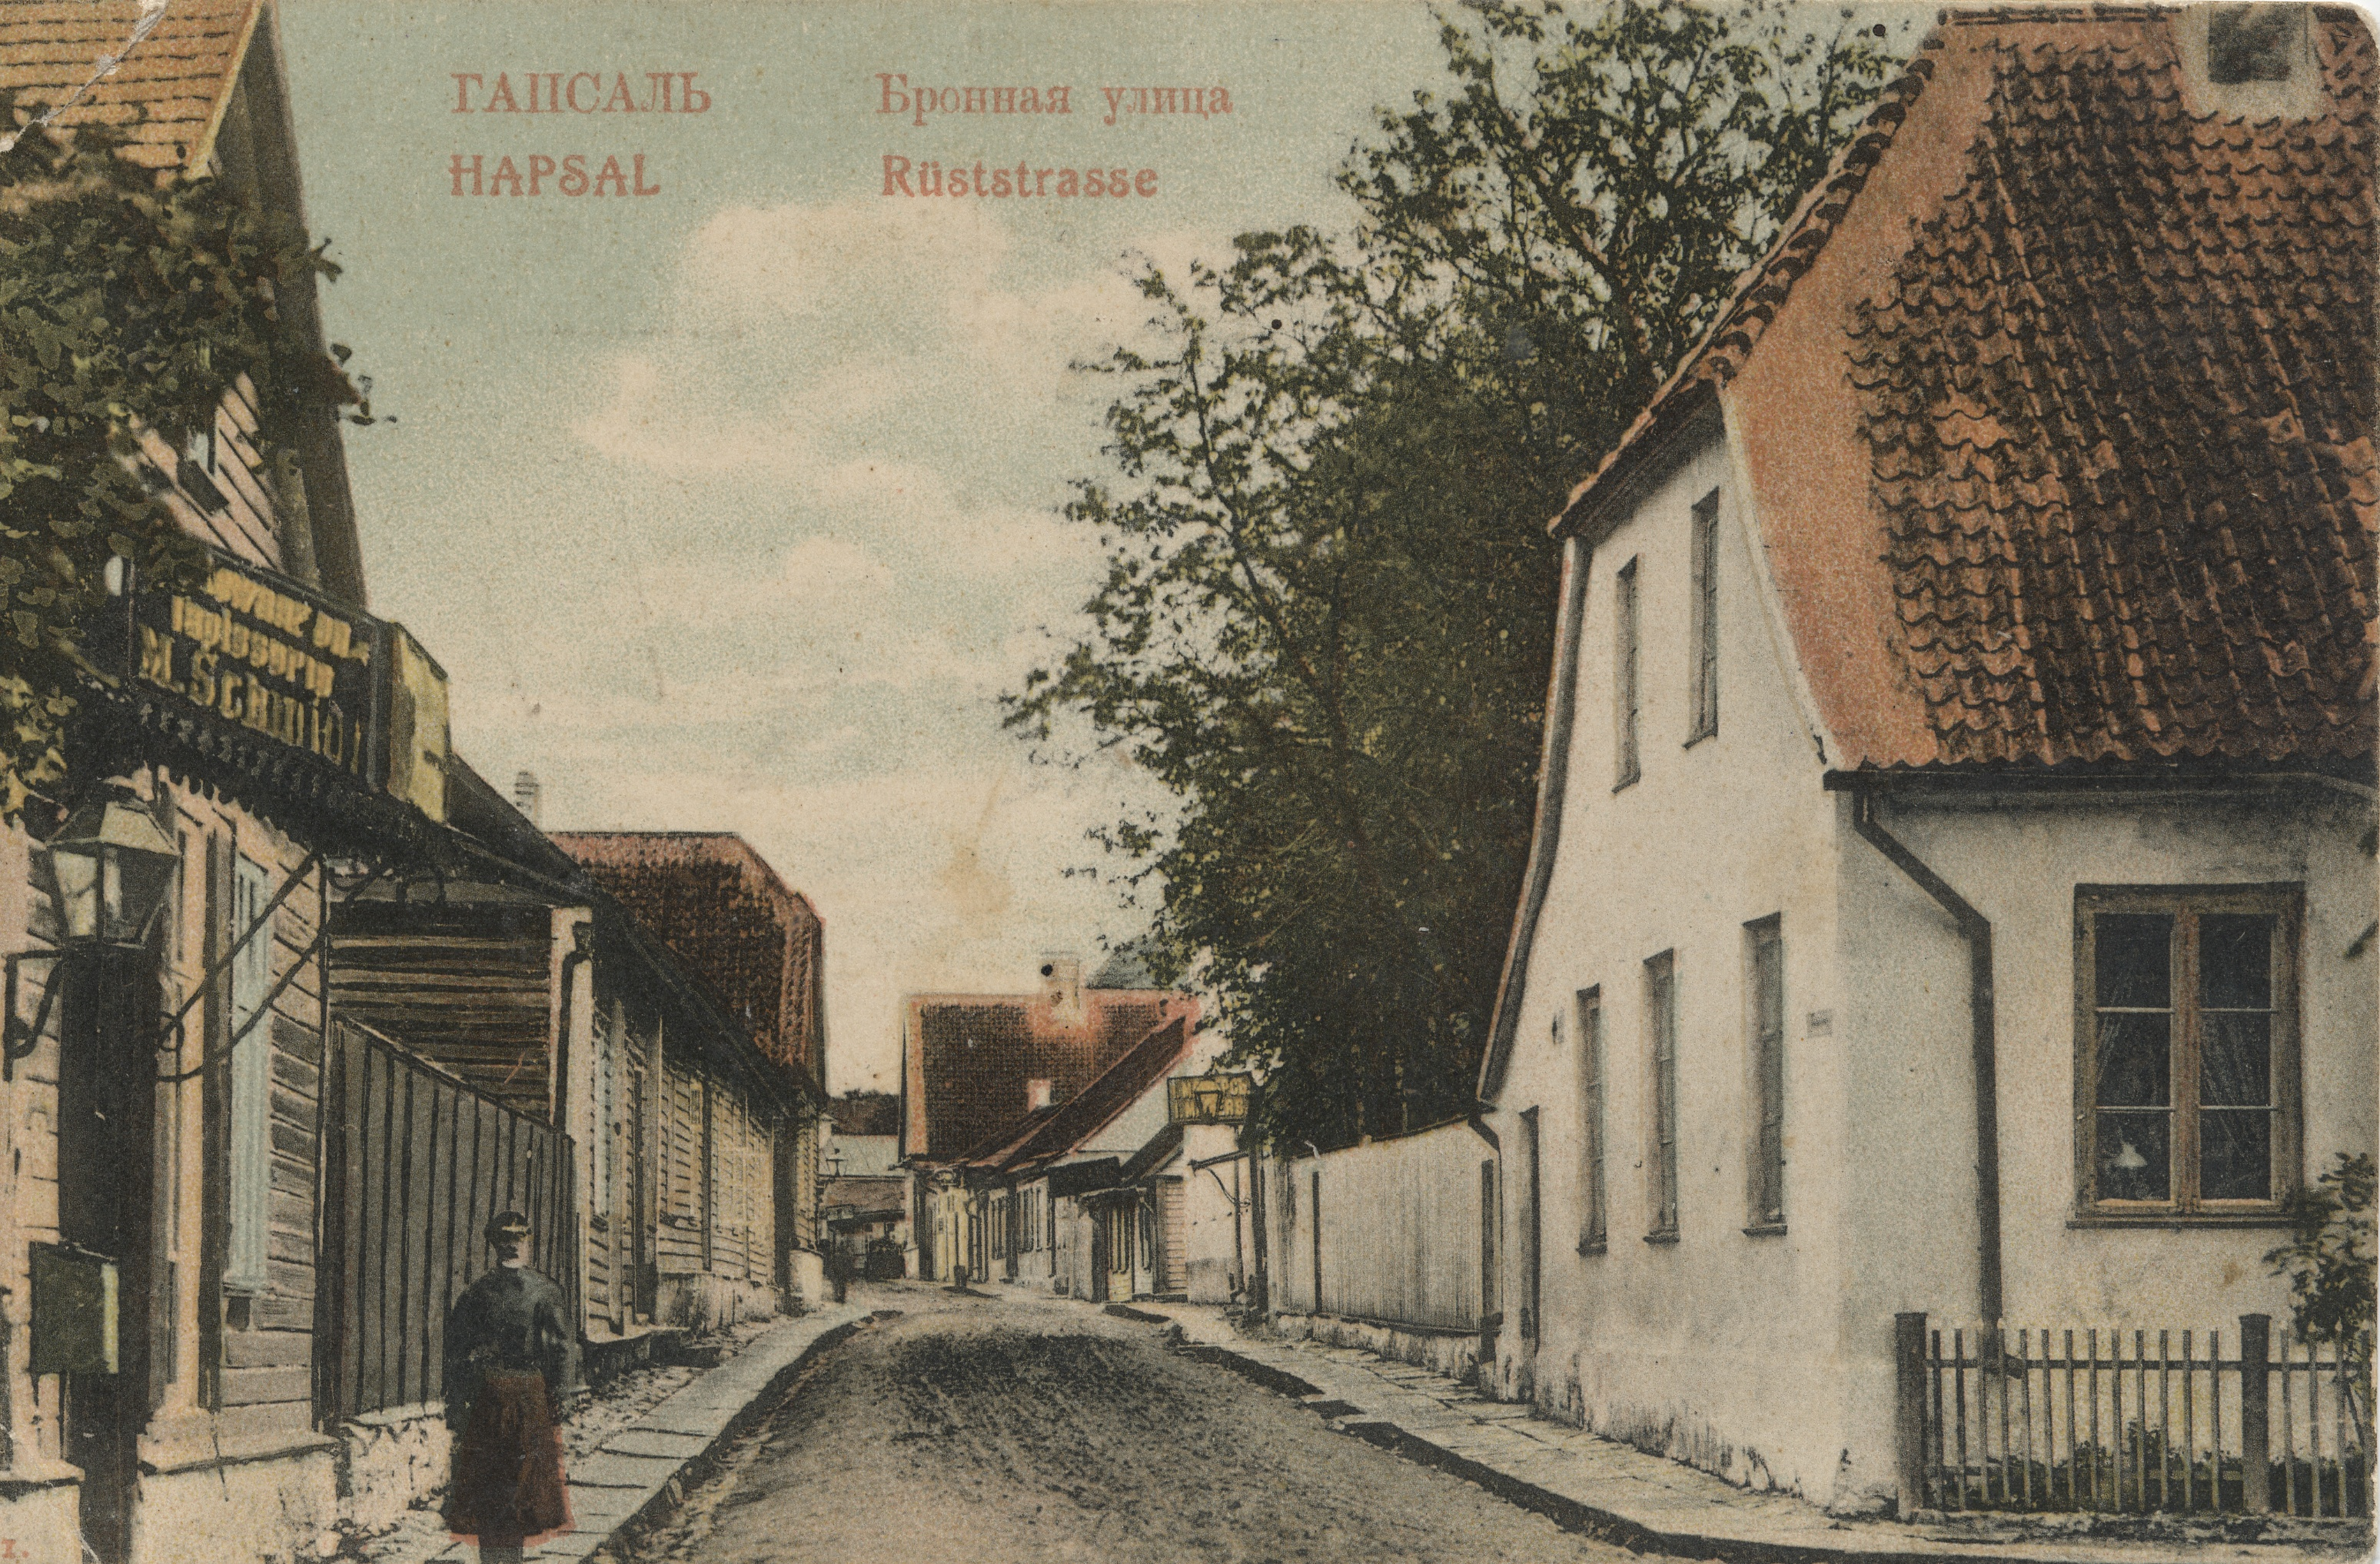 Бронная улица